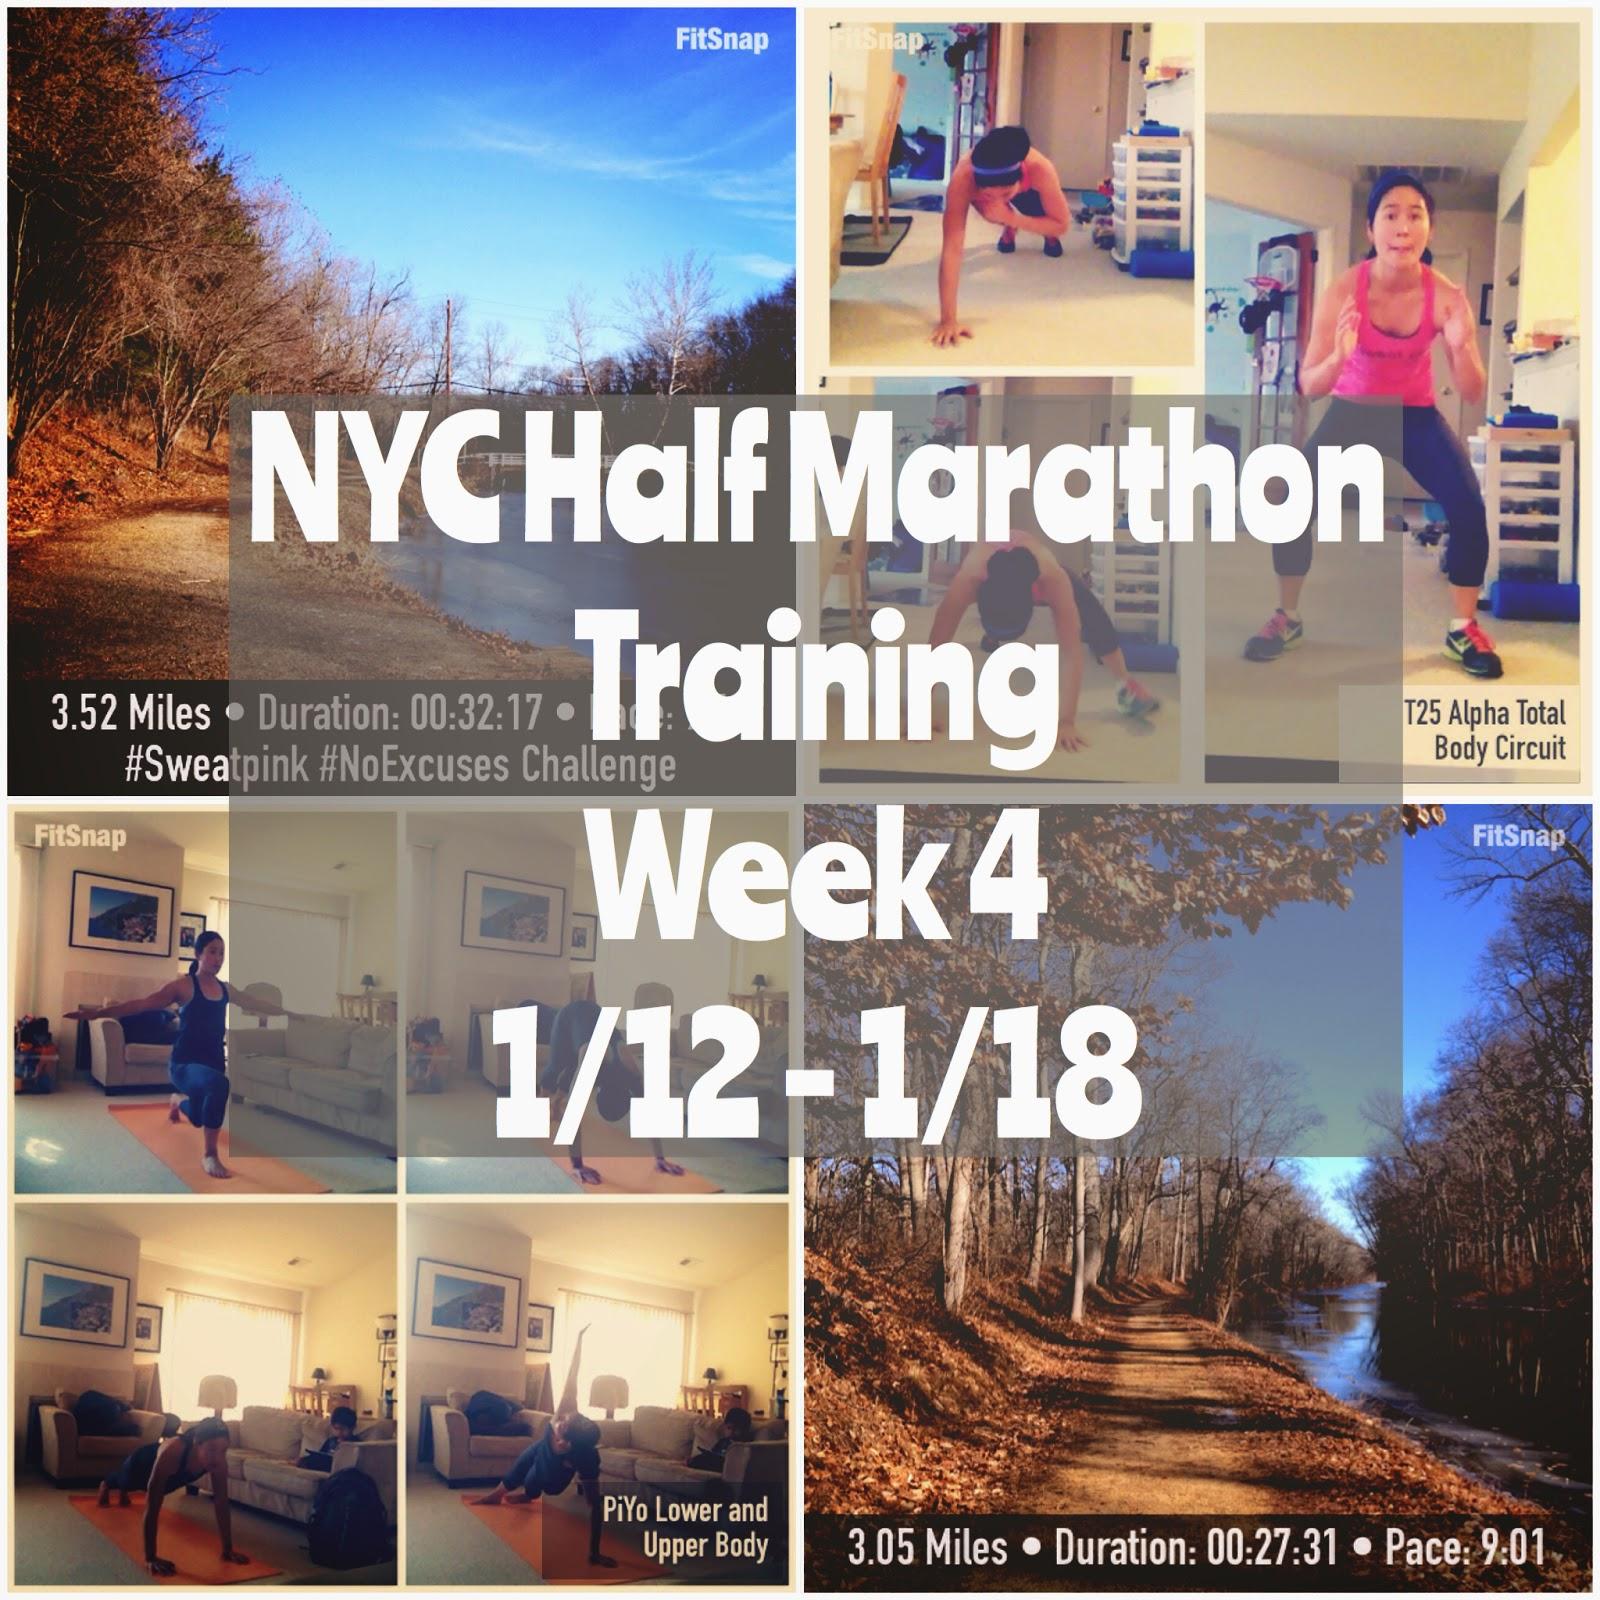 Run-Hike-Play: NYC Half Marathon Training Week 4: 1/12-1/18